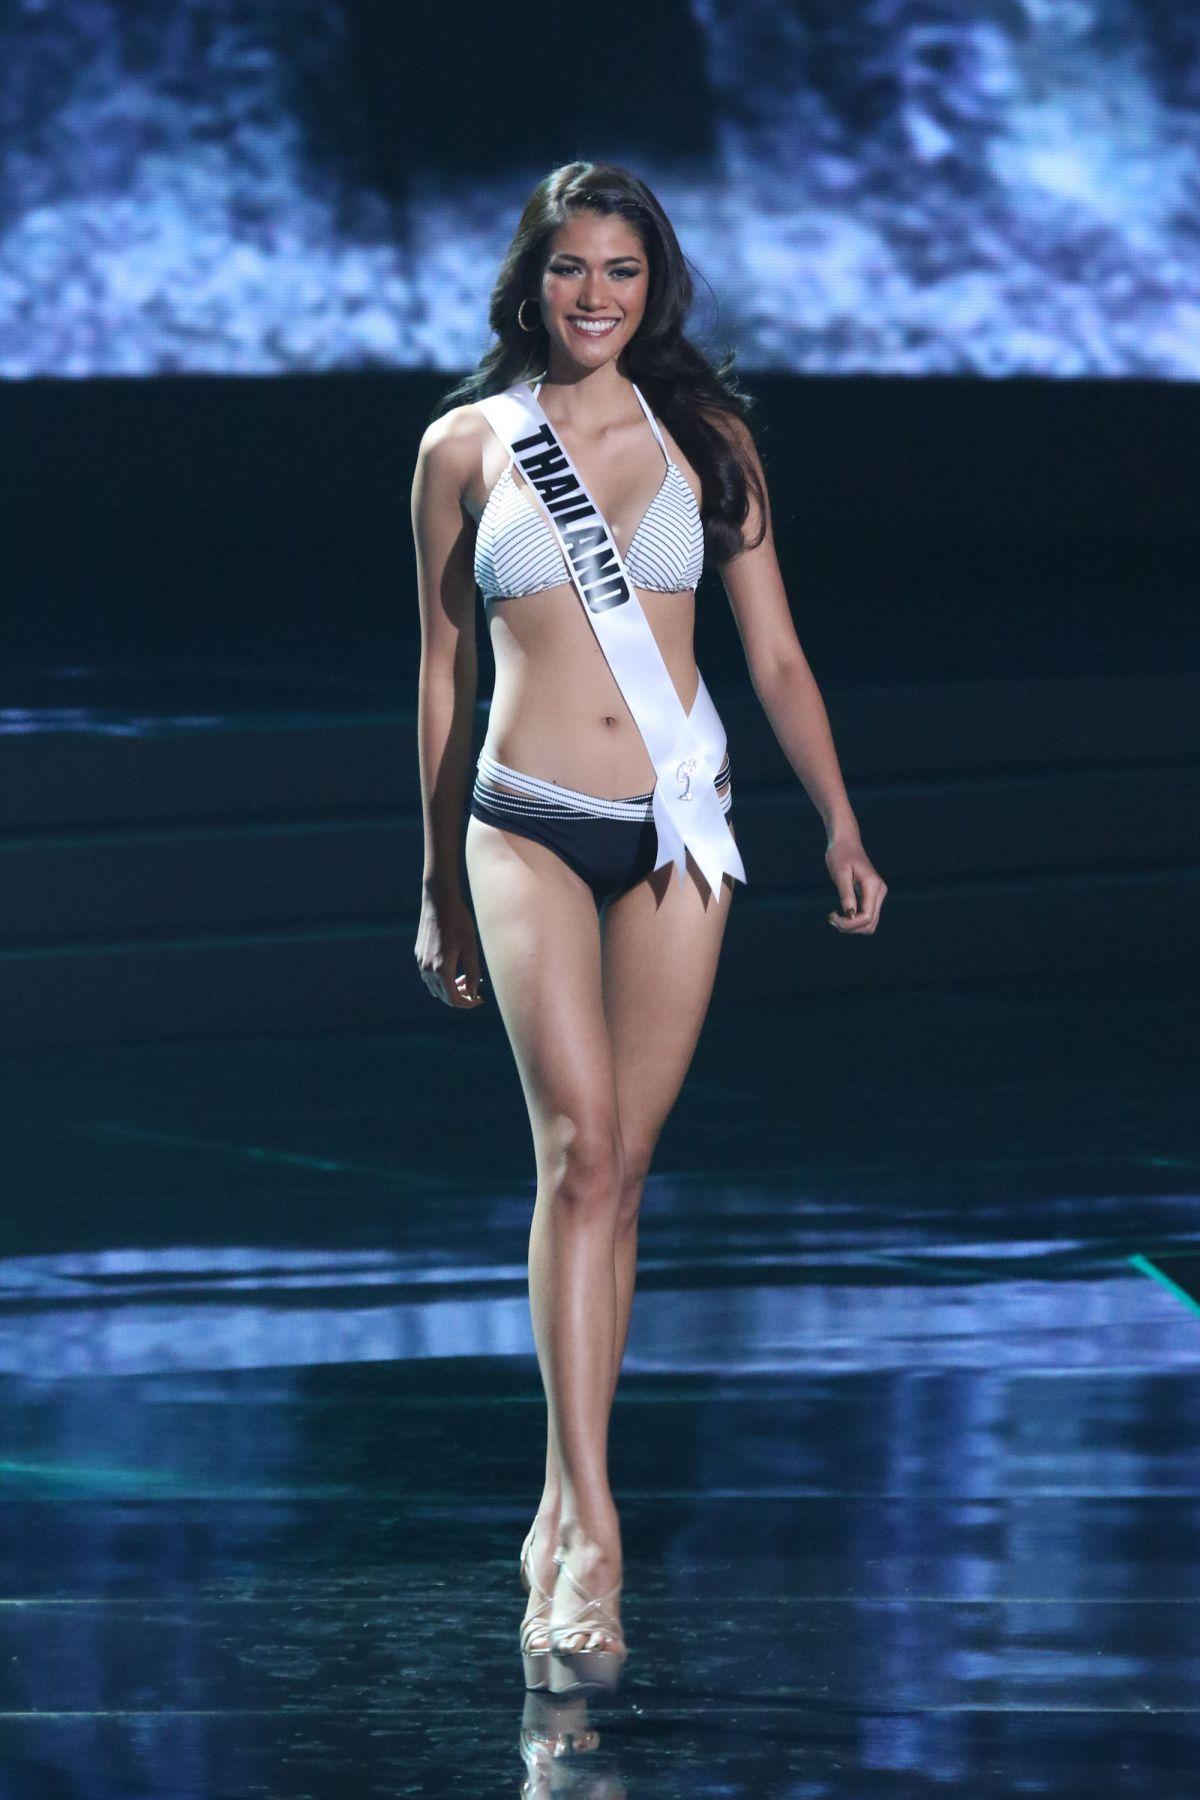 ANIPORN CHALERMBURANAWONG - Miss Universe 2015 Preliminary Round 12/16/2015